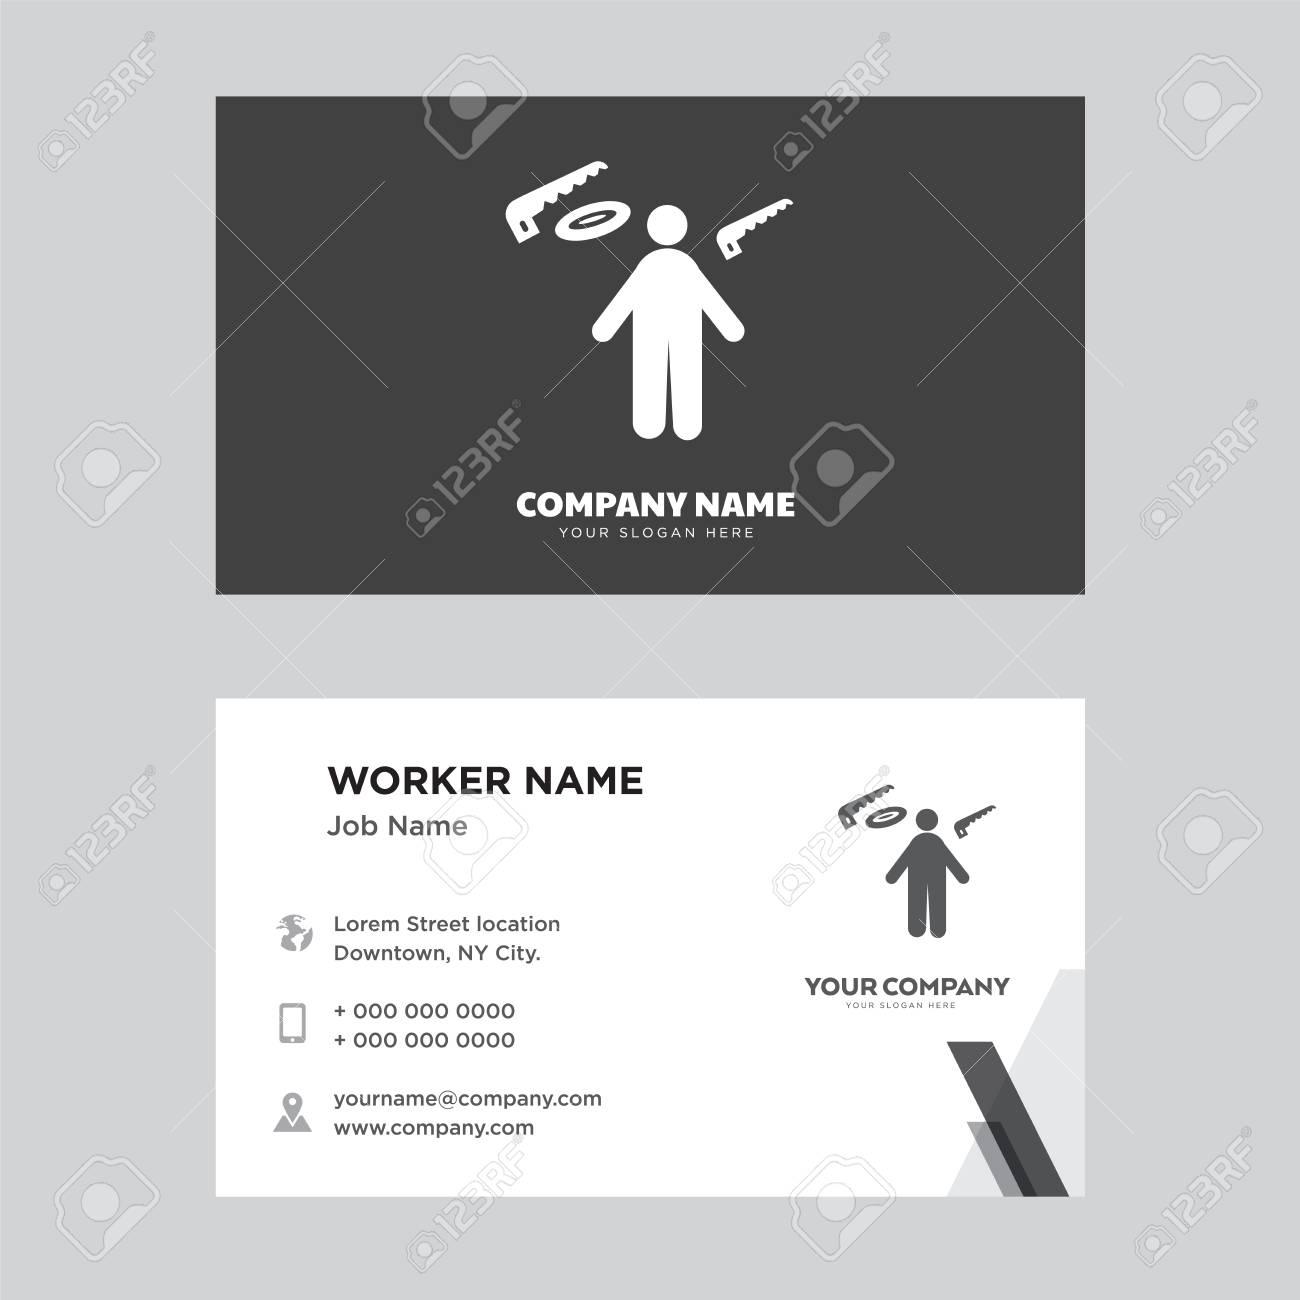 Carpenter business card design template visiting for your company carpenter business card design template visiting for your company modern horizontal identity card vector fbccfo Choice Image